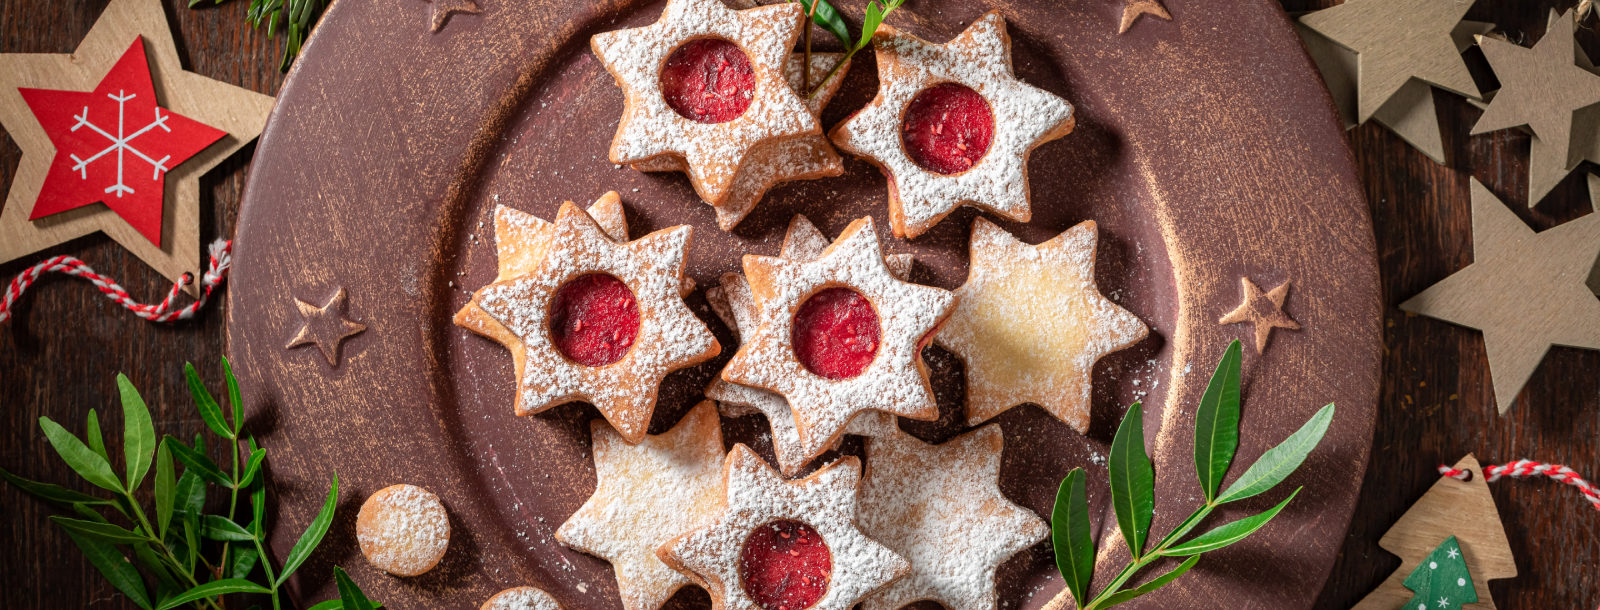 Biscuits vitraux_la Perruche